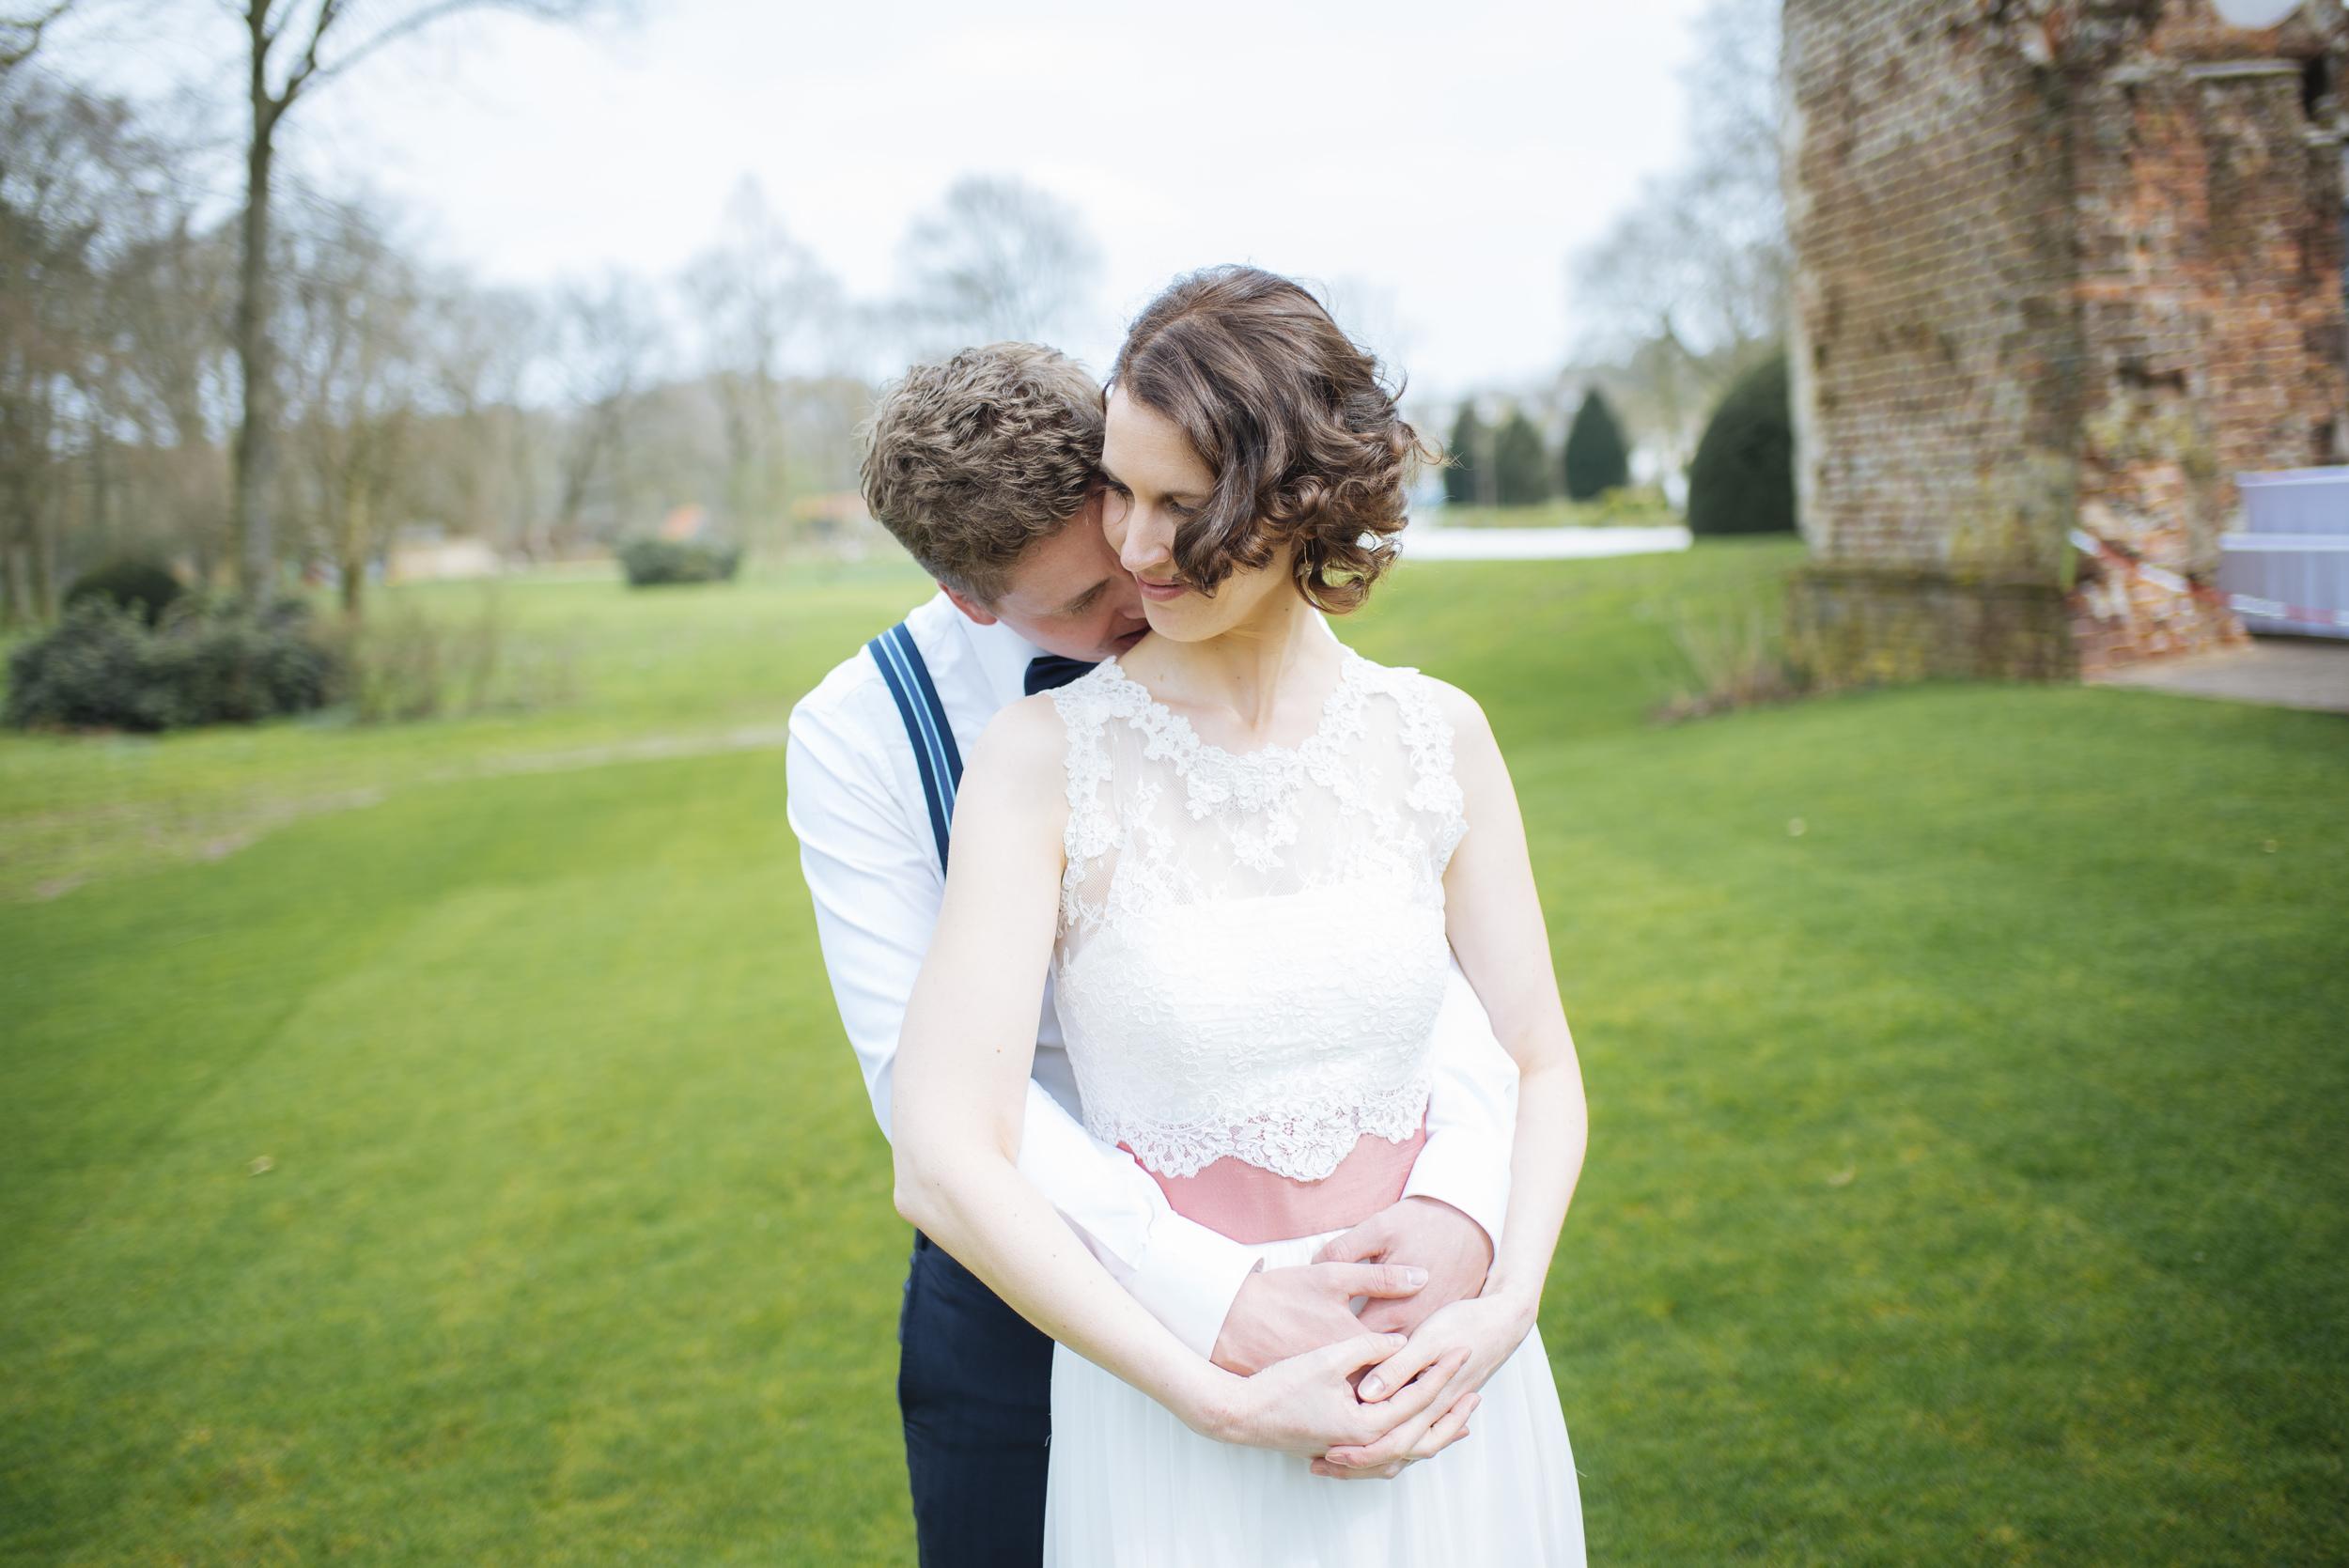 Hochzeitsfotograf-Schlossruine-Hertefeld-Weeze-023.jpg